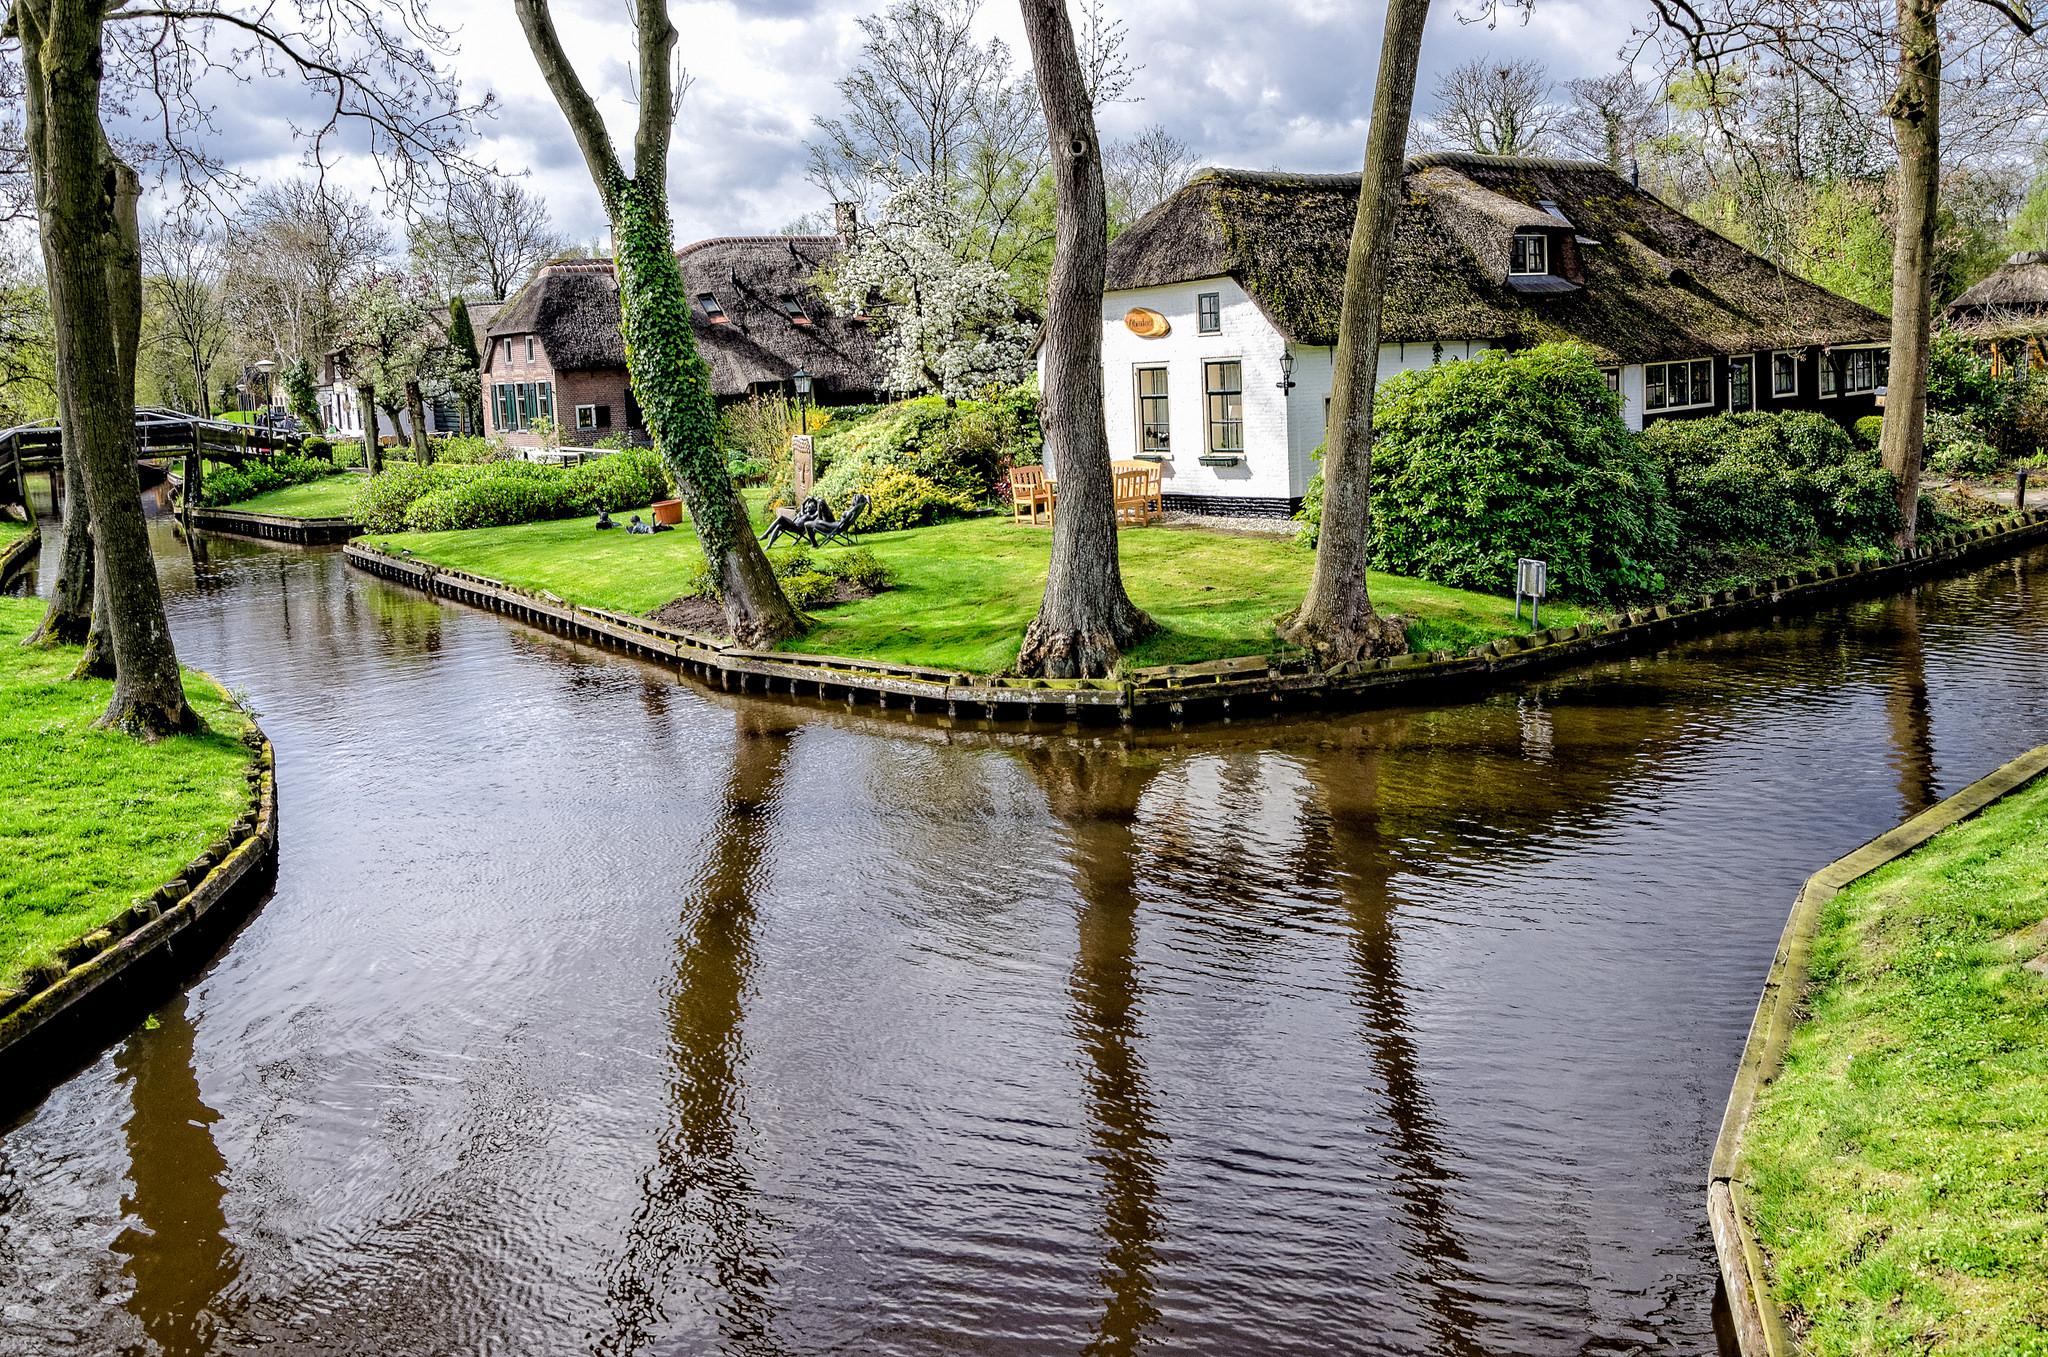 Giethoorn la citt senza strade in olanda for Tiny house holland michigan